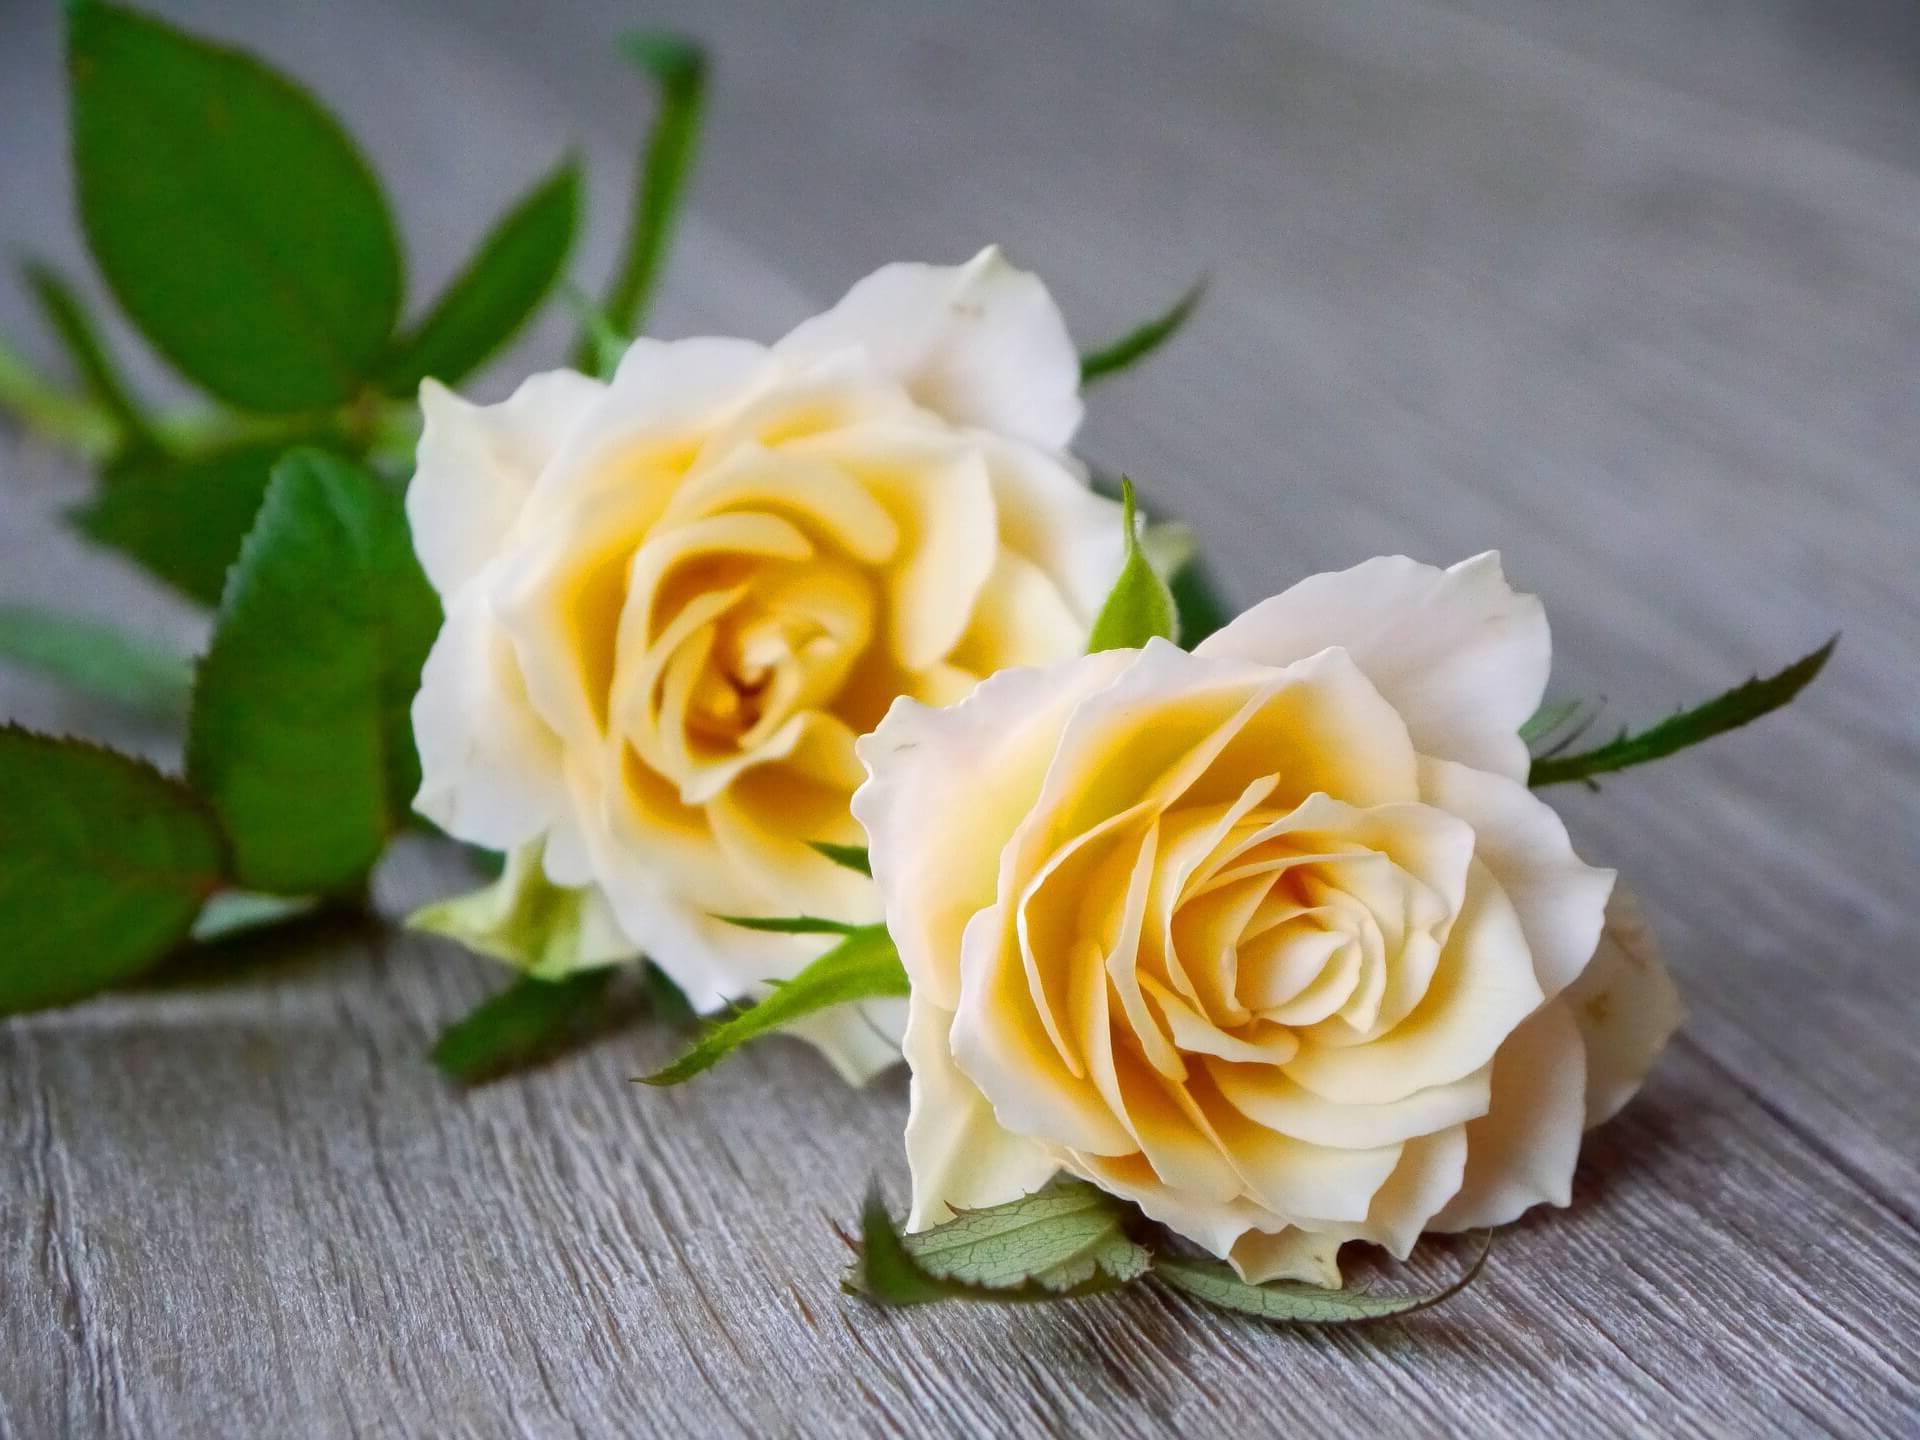 ¿Como enviar ramos de flores a Ventosa del Rio Almar?